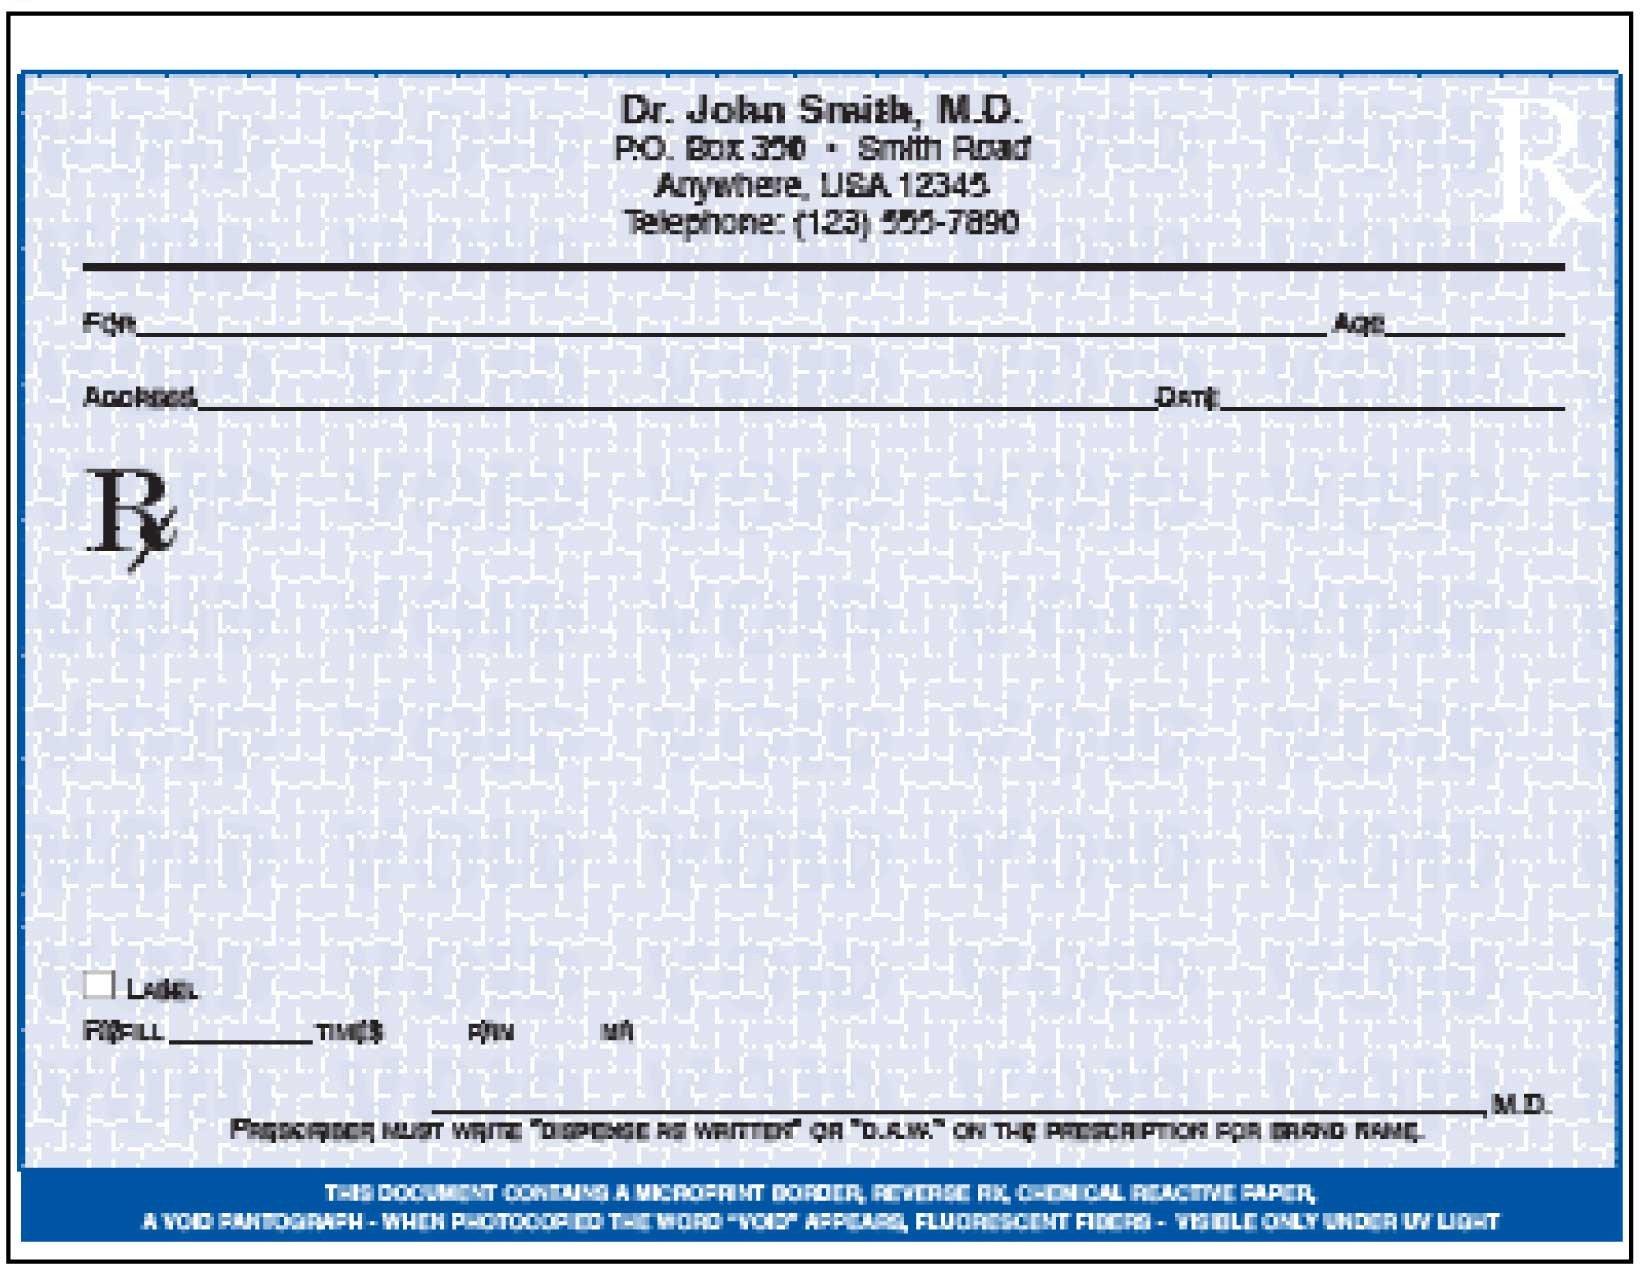 Picture Of Prescription Pad October 2014